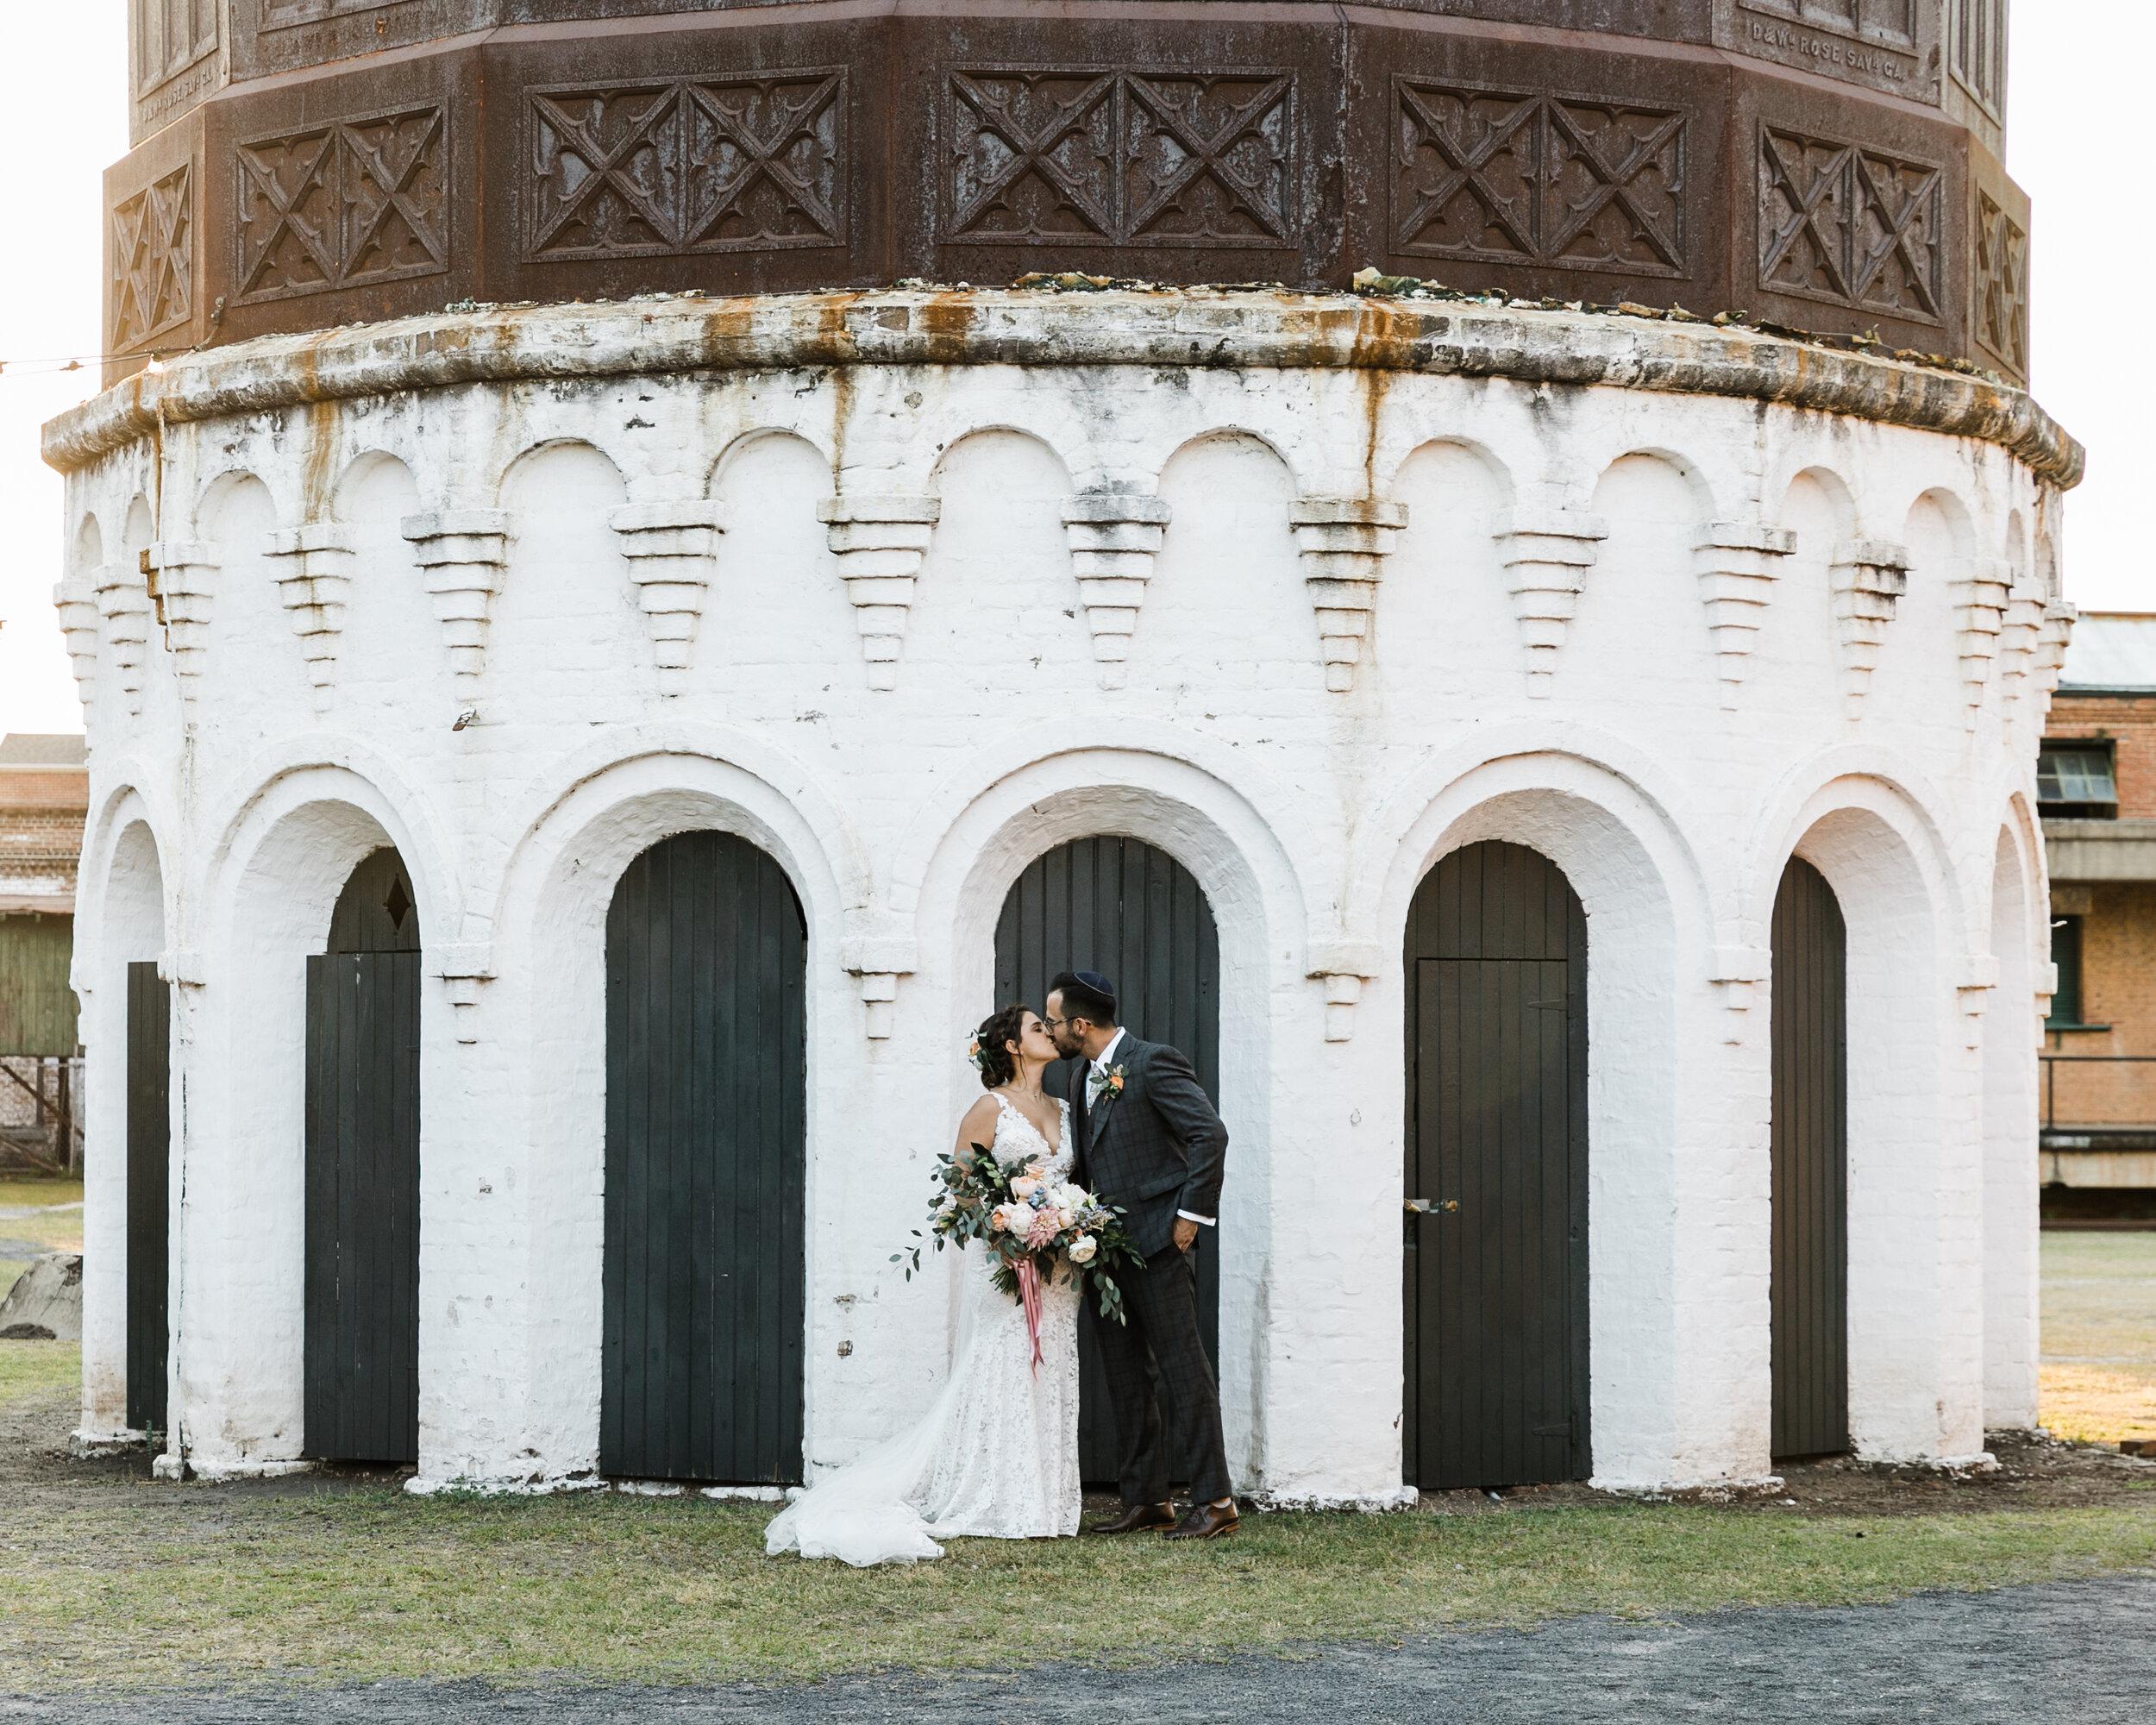 ivory-and-beau-blog-weddings-ivory-and-beau-couple-dominique-and-andres-savannah-florist-wedding-planning-savannah-bridal-boutique-wedding-flowers-KIP_WEBERWEDDING_RAILROADMUSEUM-1288.JPG